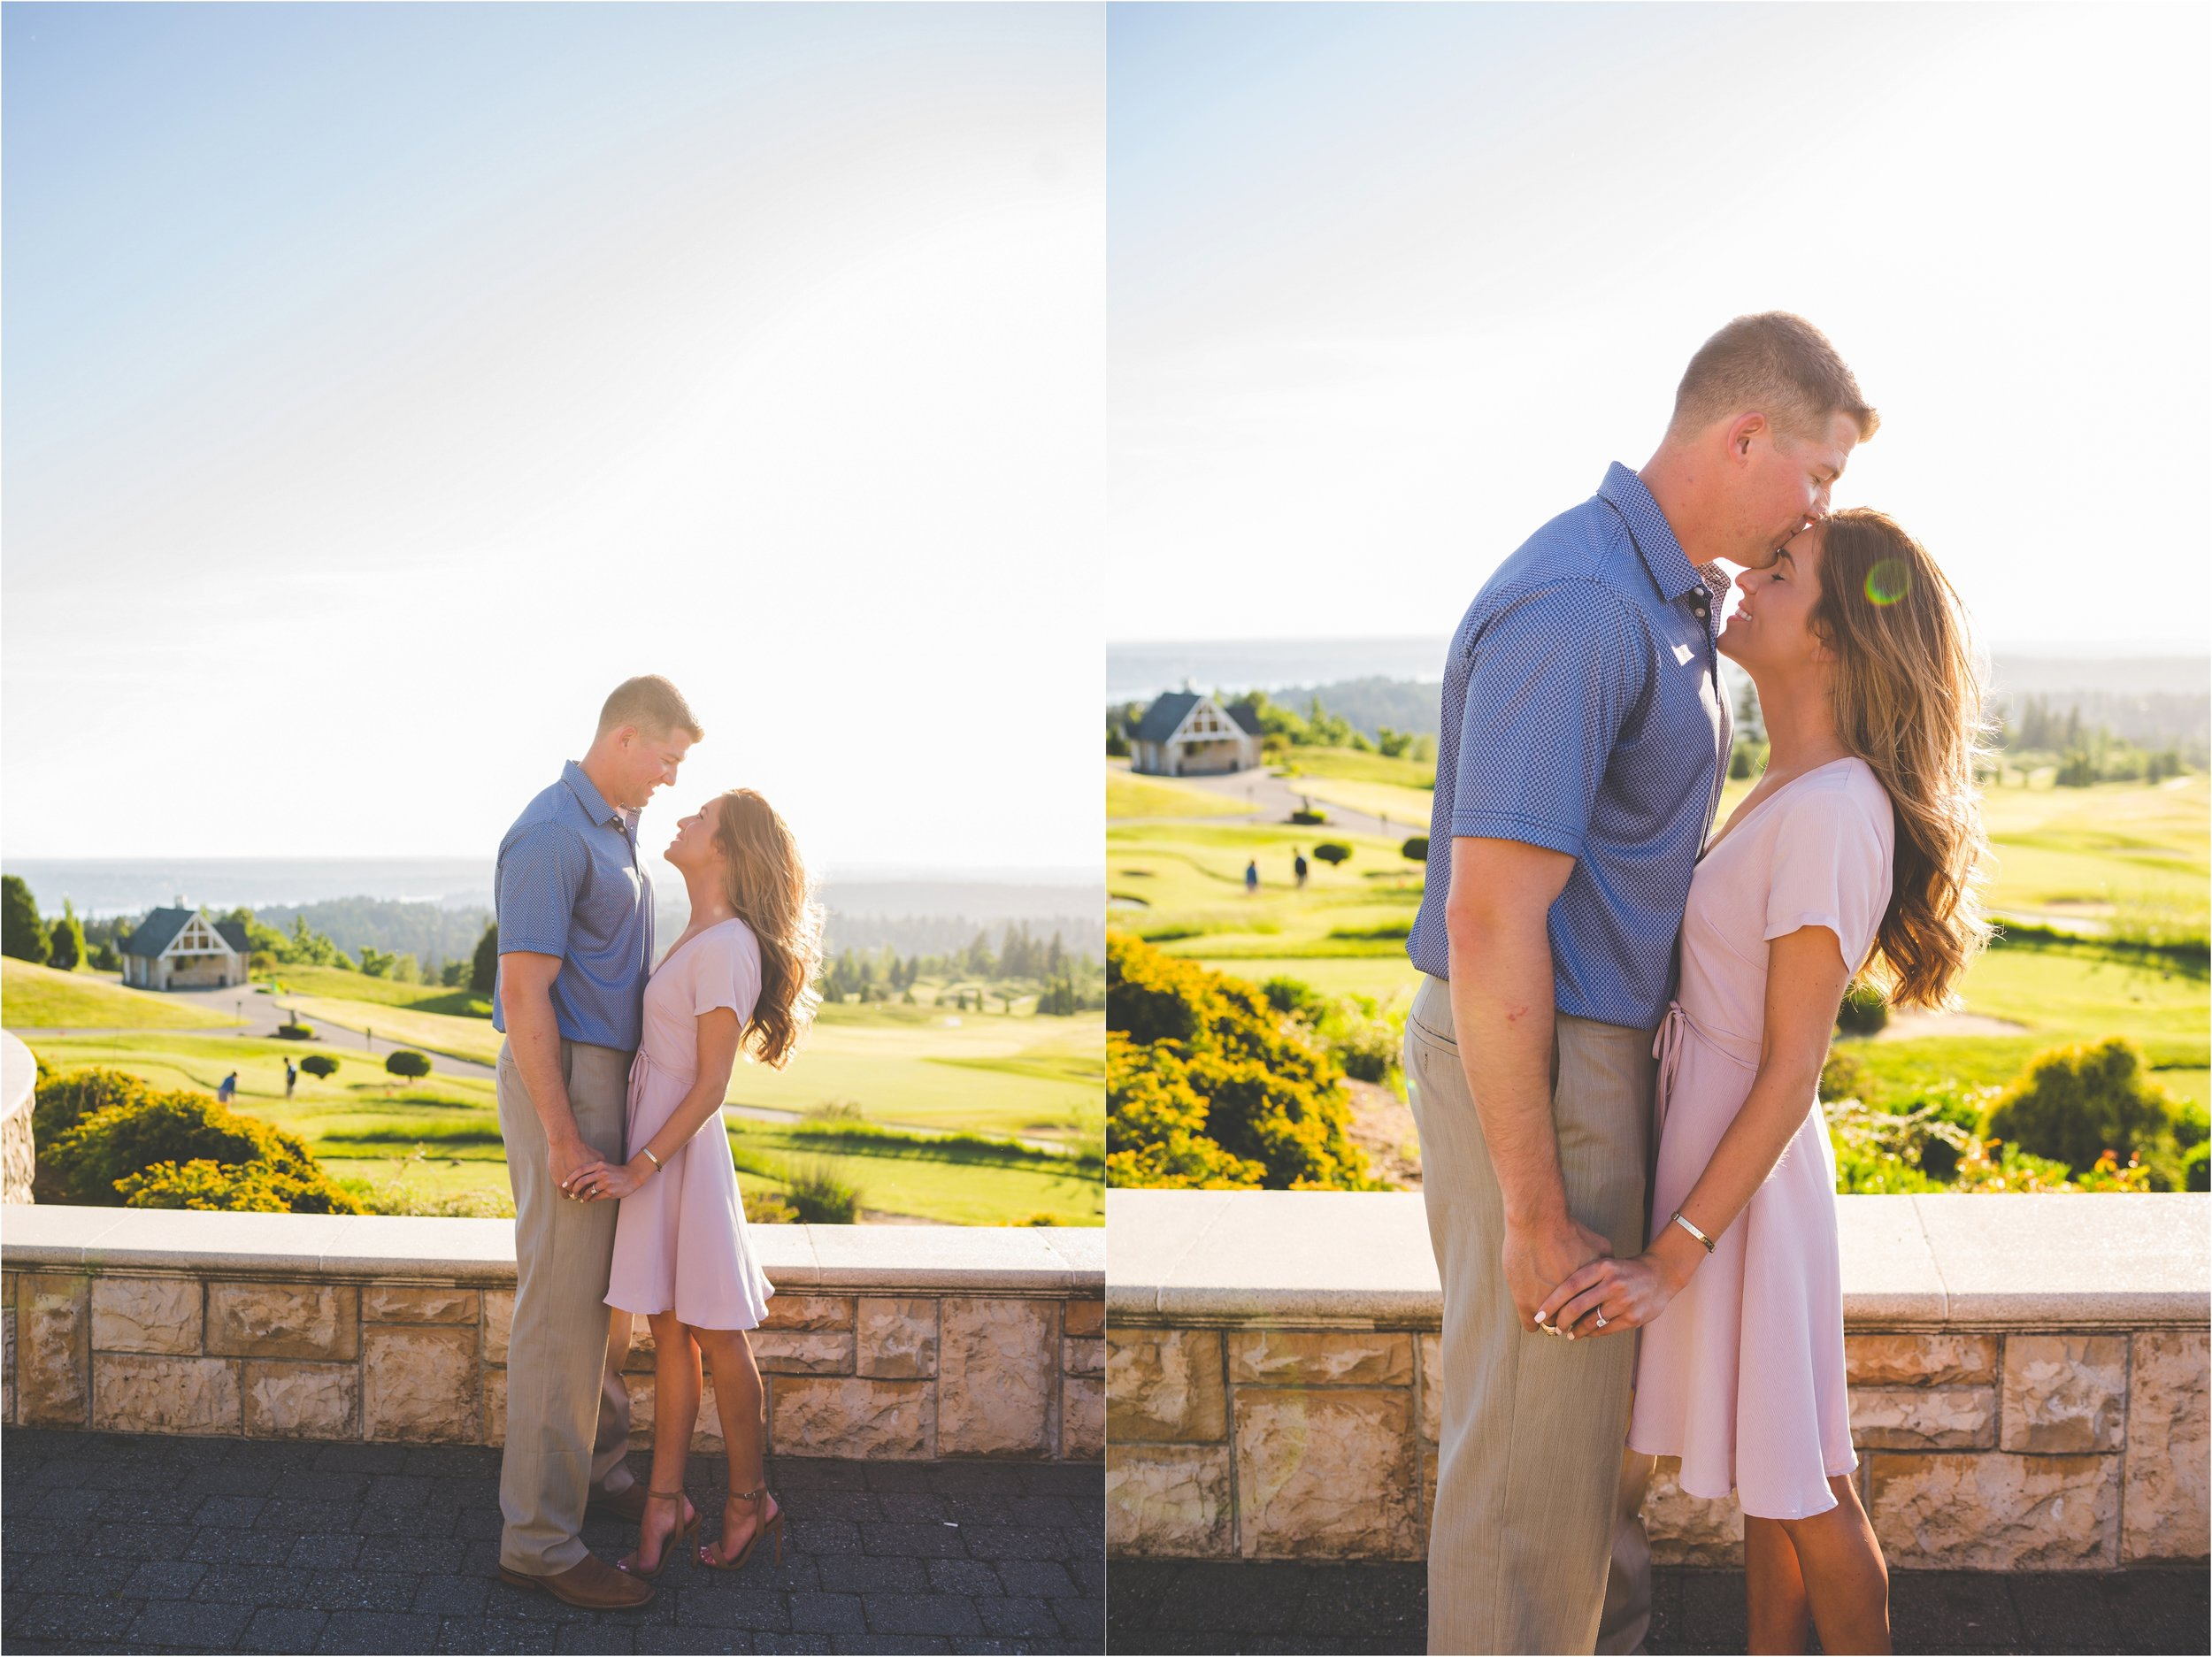 newcastle-golf-club-proposal-jannicka-mayte-seattle-washington-engagement-wedding-photographer_0029.jpg